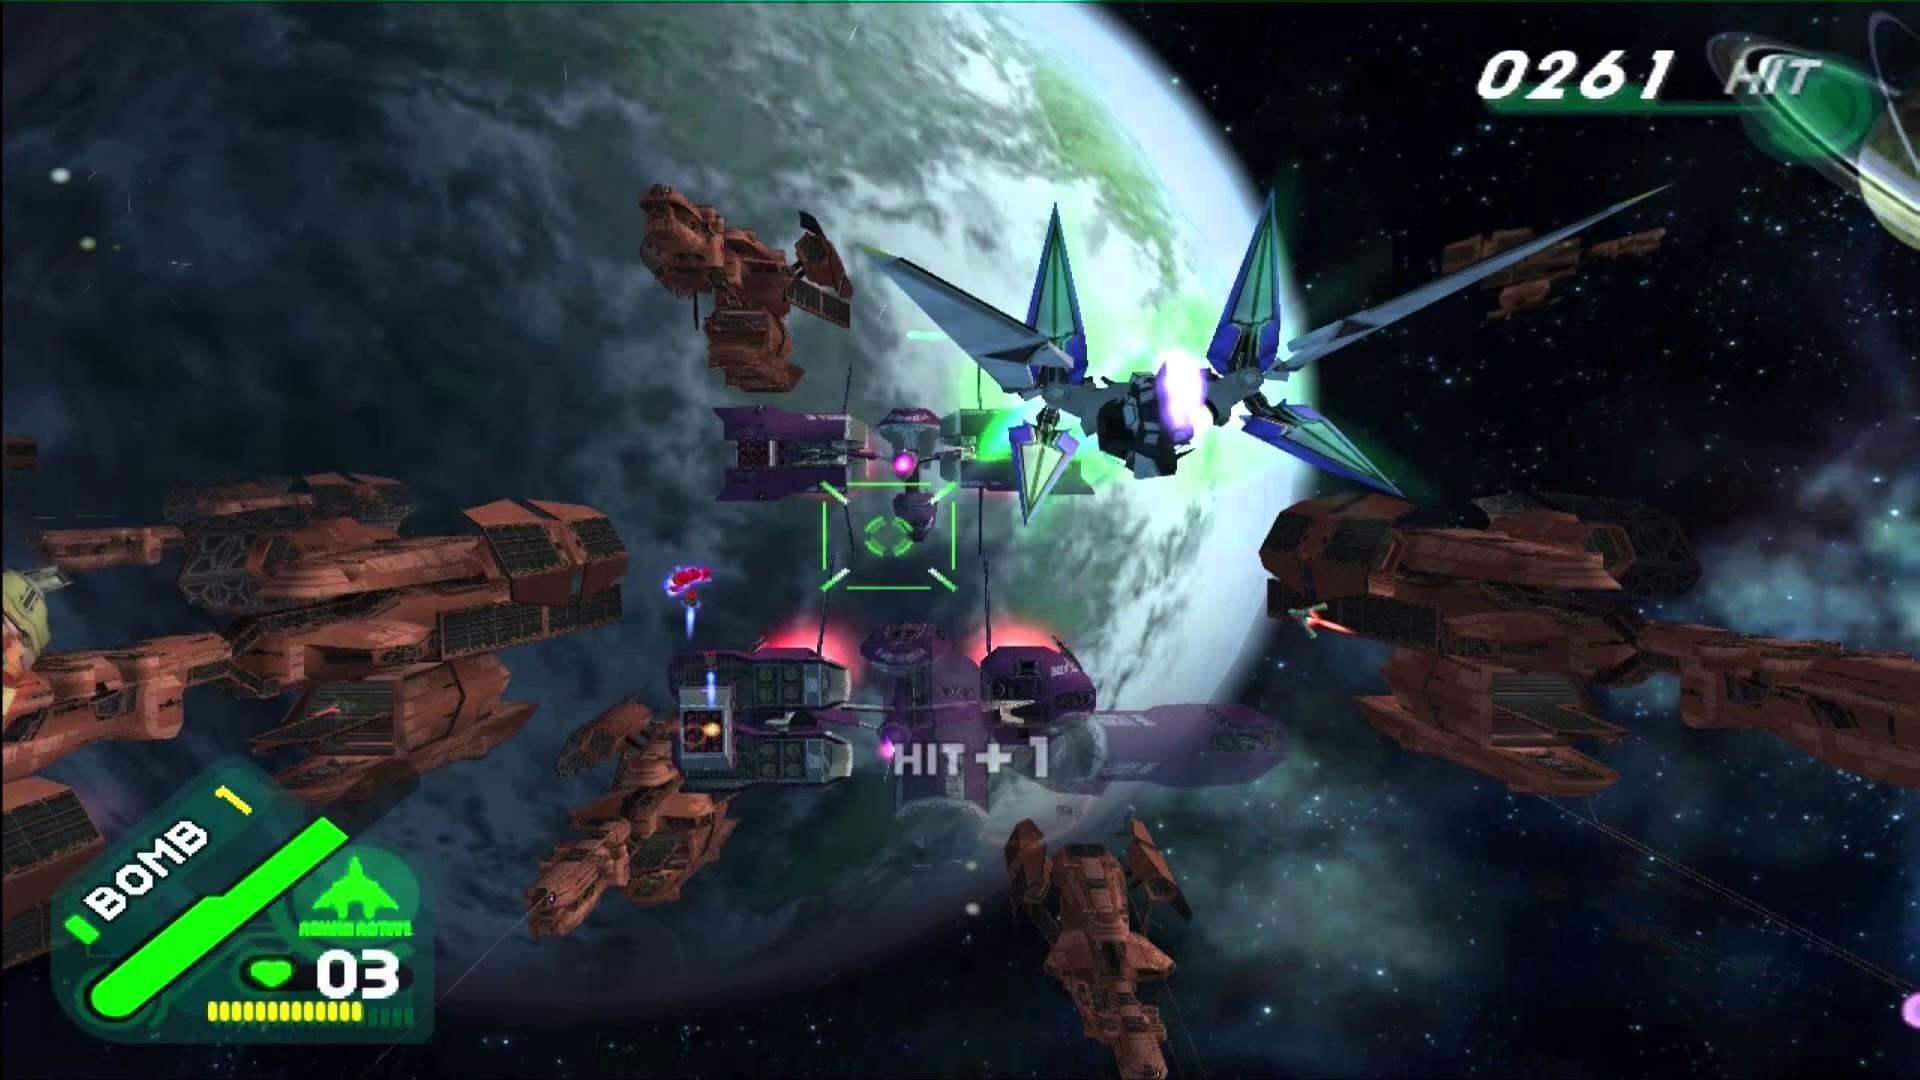 Star Fox Assault – Dolphin HQ Test Video